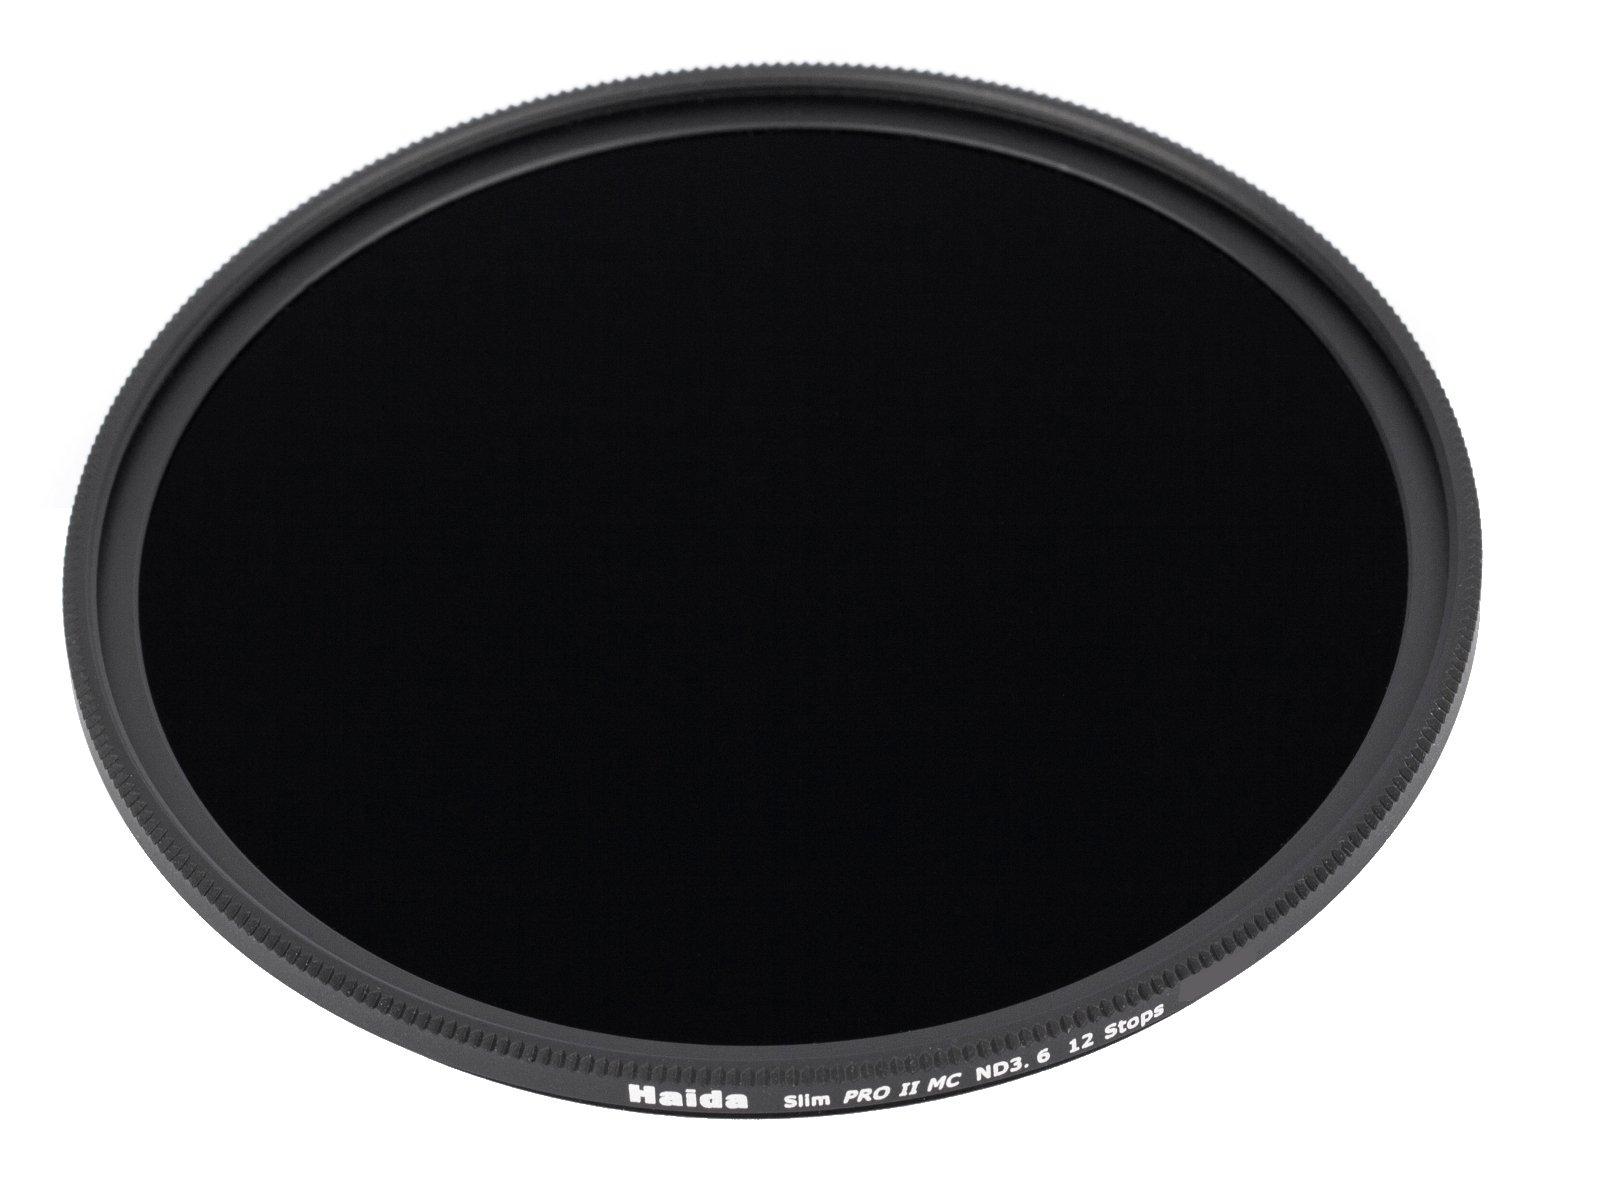 Haida PRO II Multi-Coated ND 3.6 4000X 12 Stops Optical Glass Neutral Density Filter, 67mm